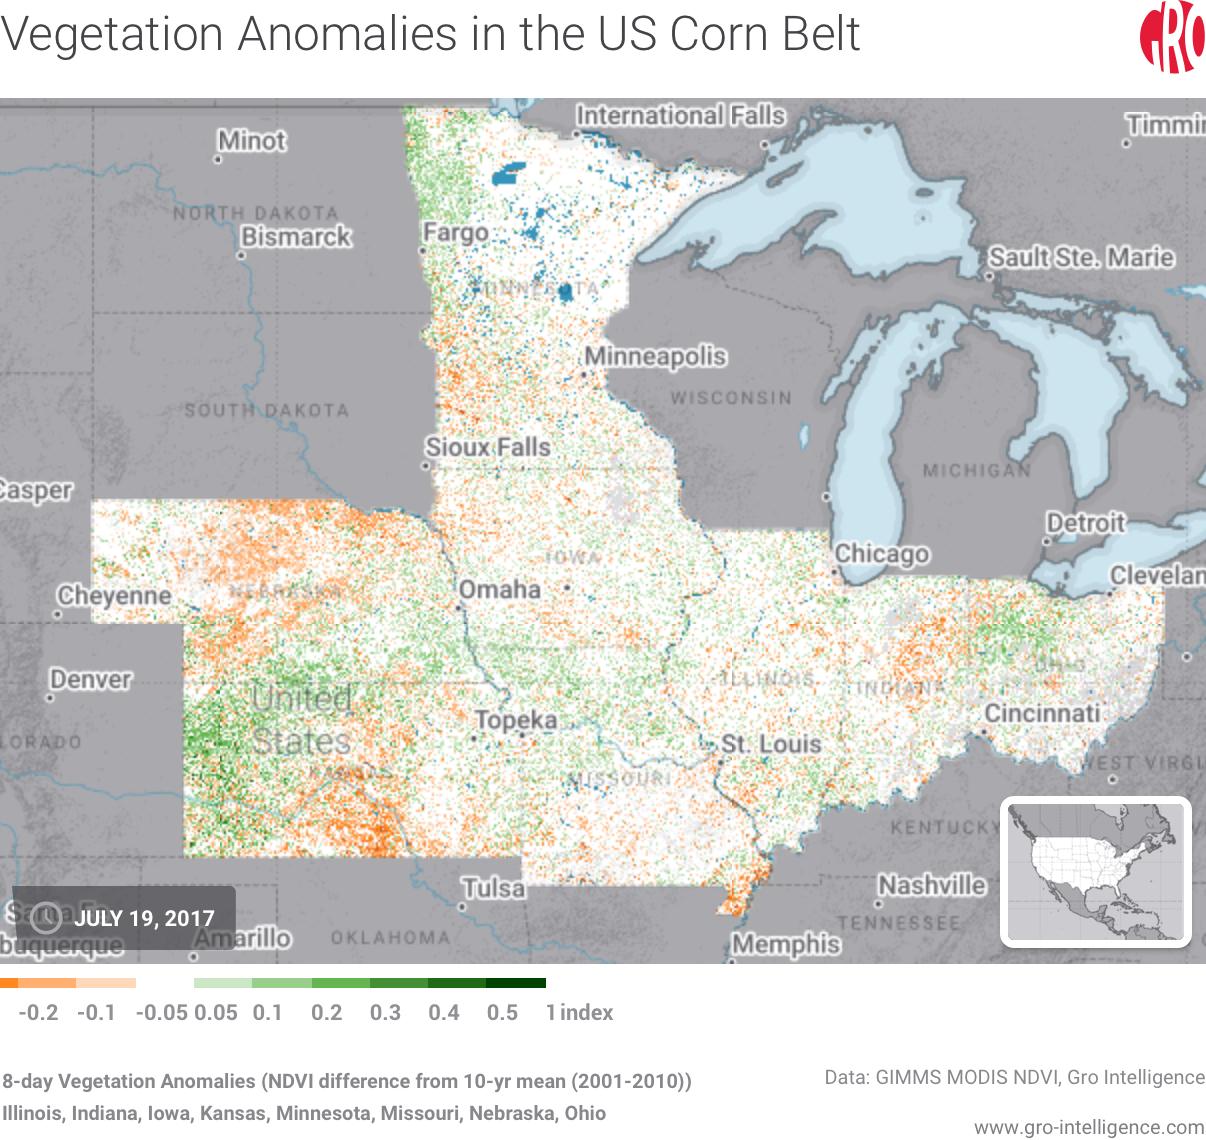 Vegetation Anomalies in the US Corn Belt